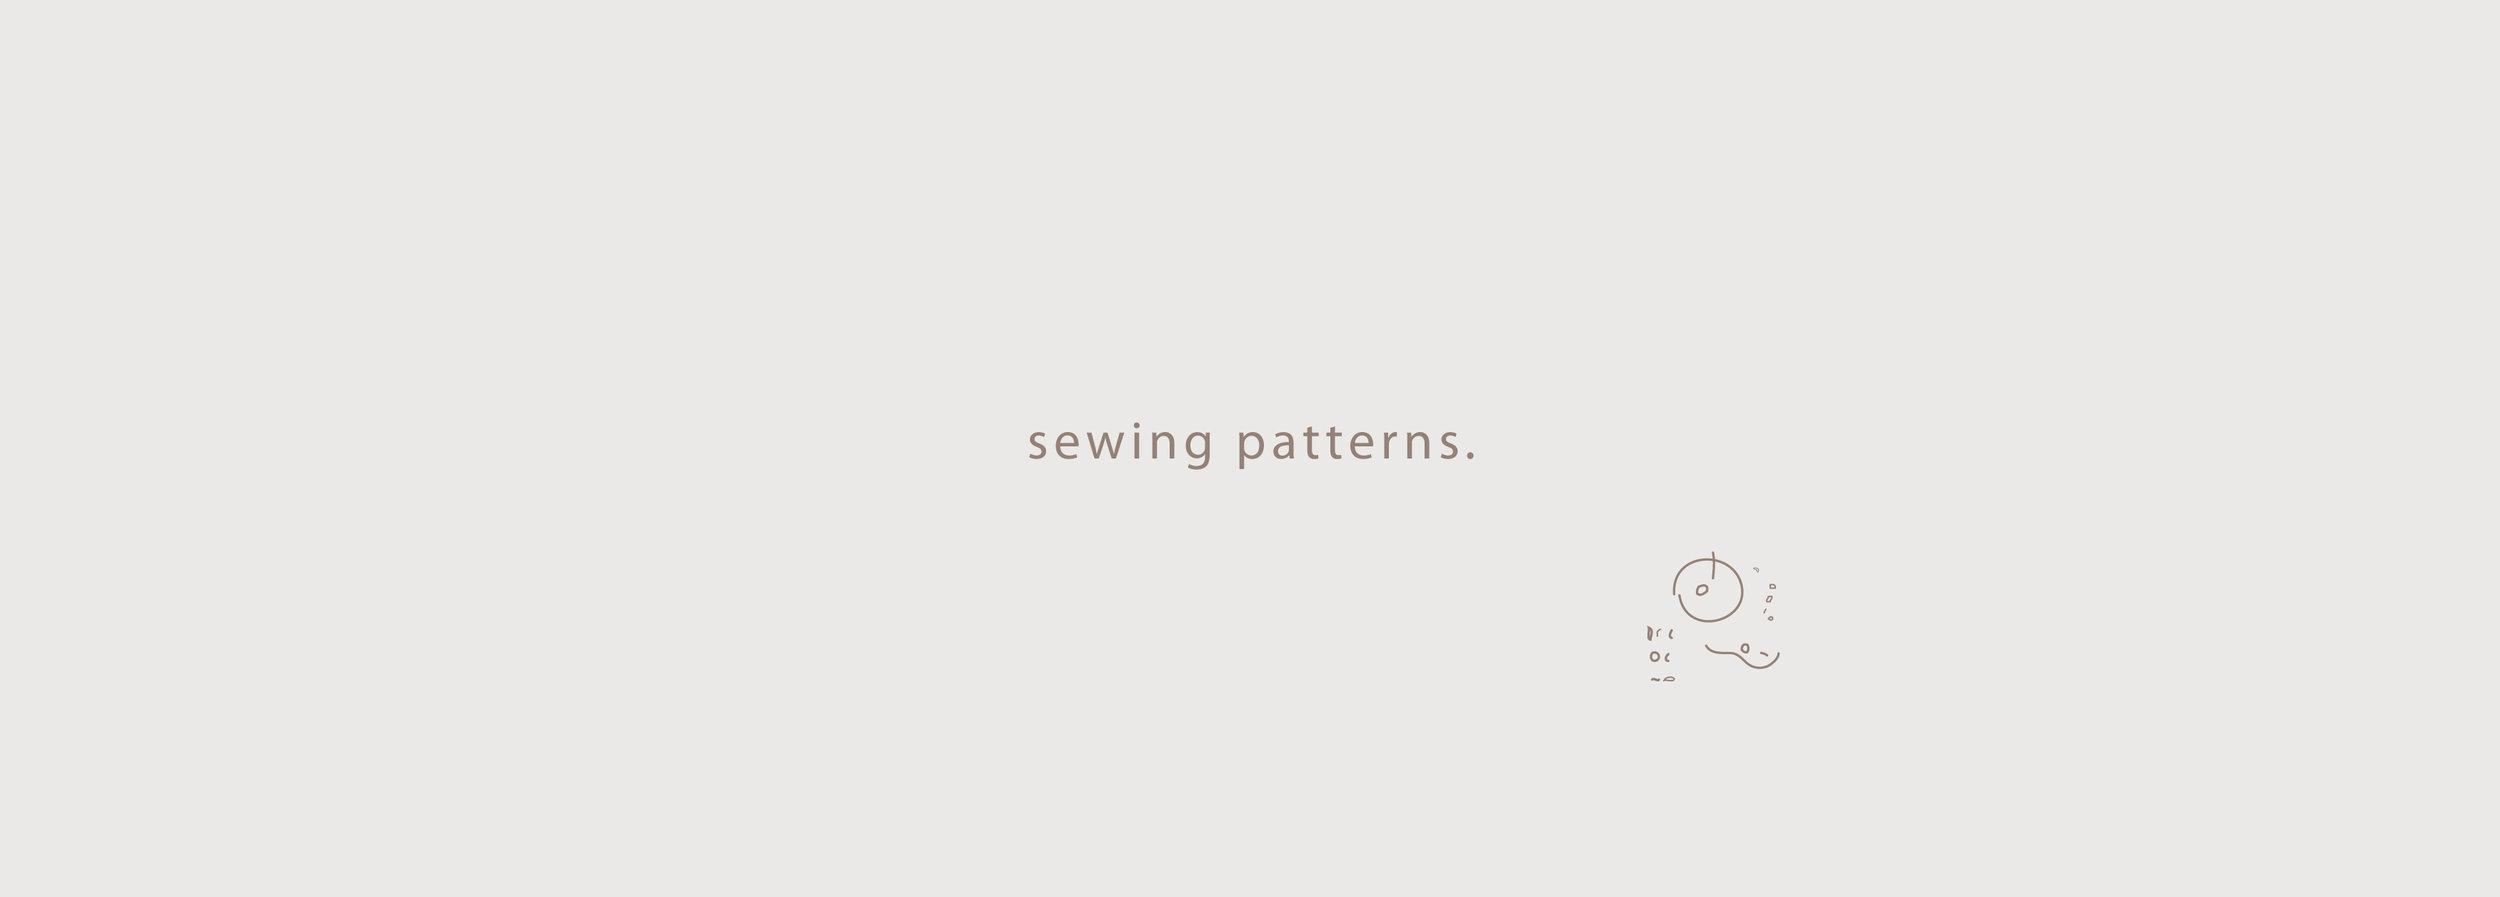 190102_Title_SewingPatterns.jpg